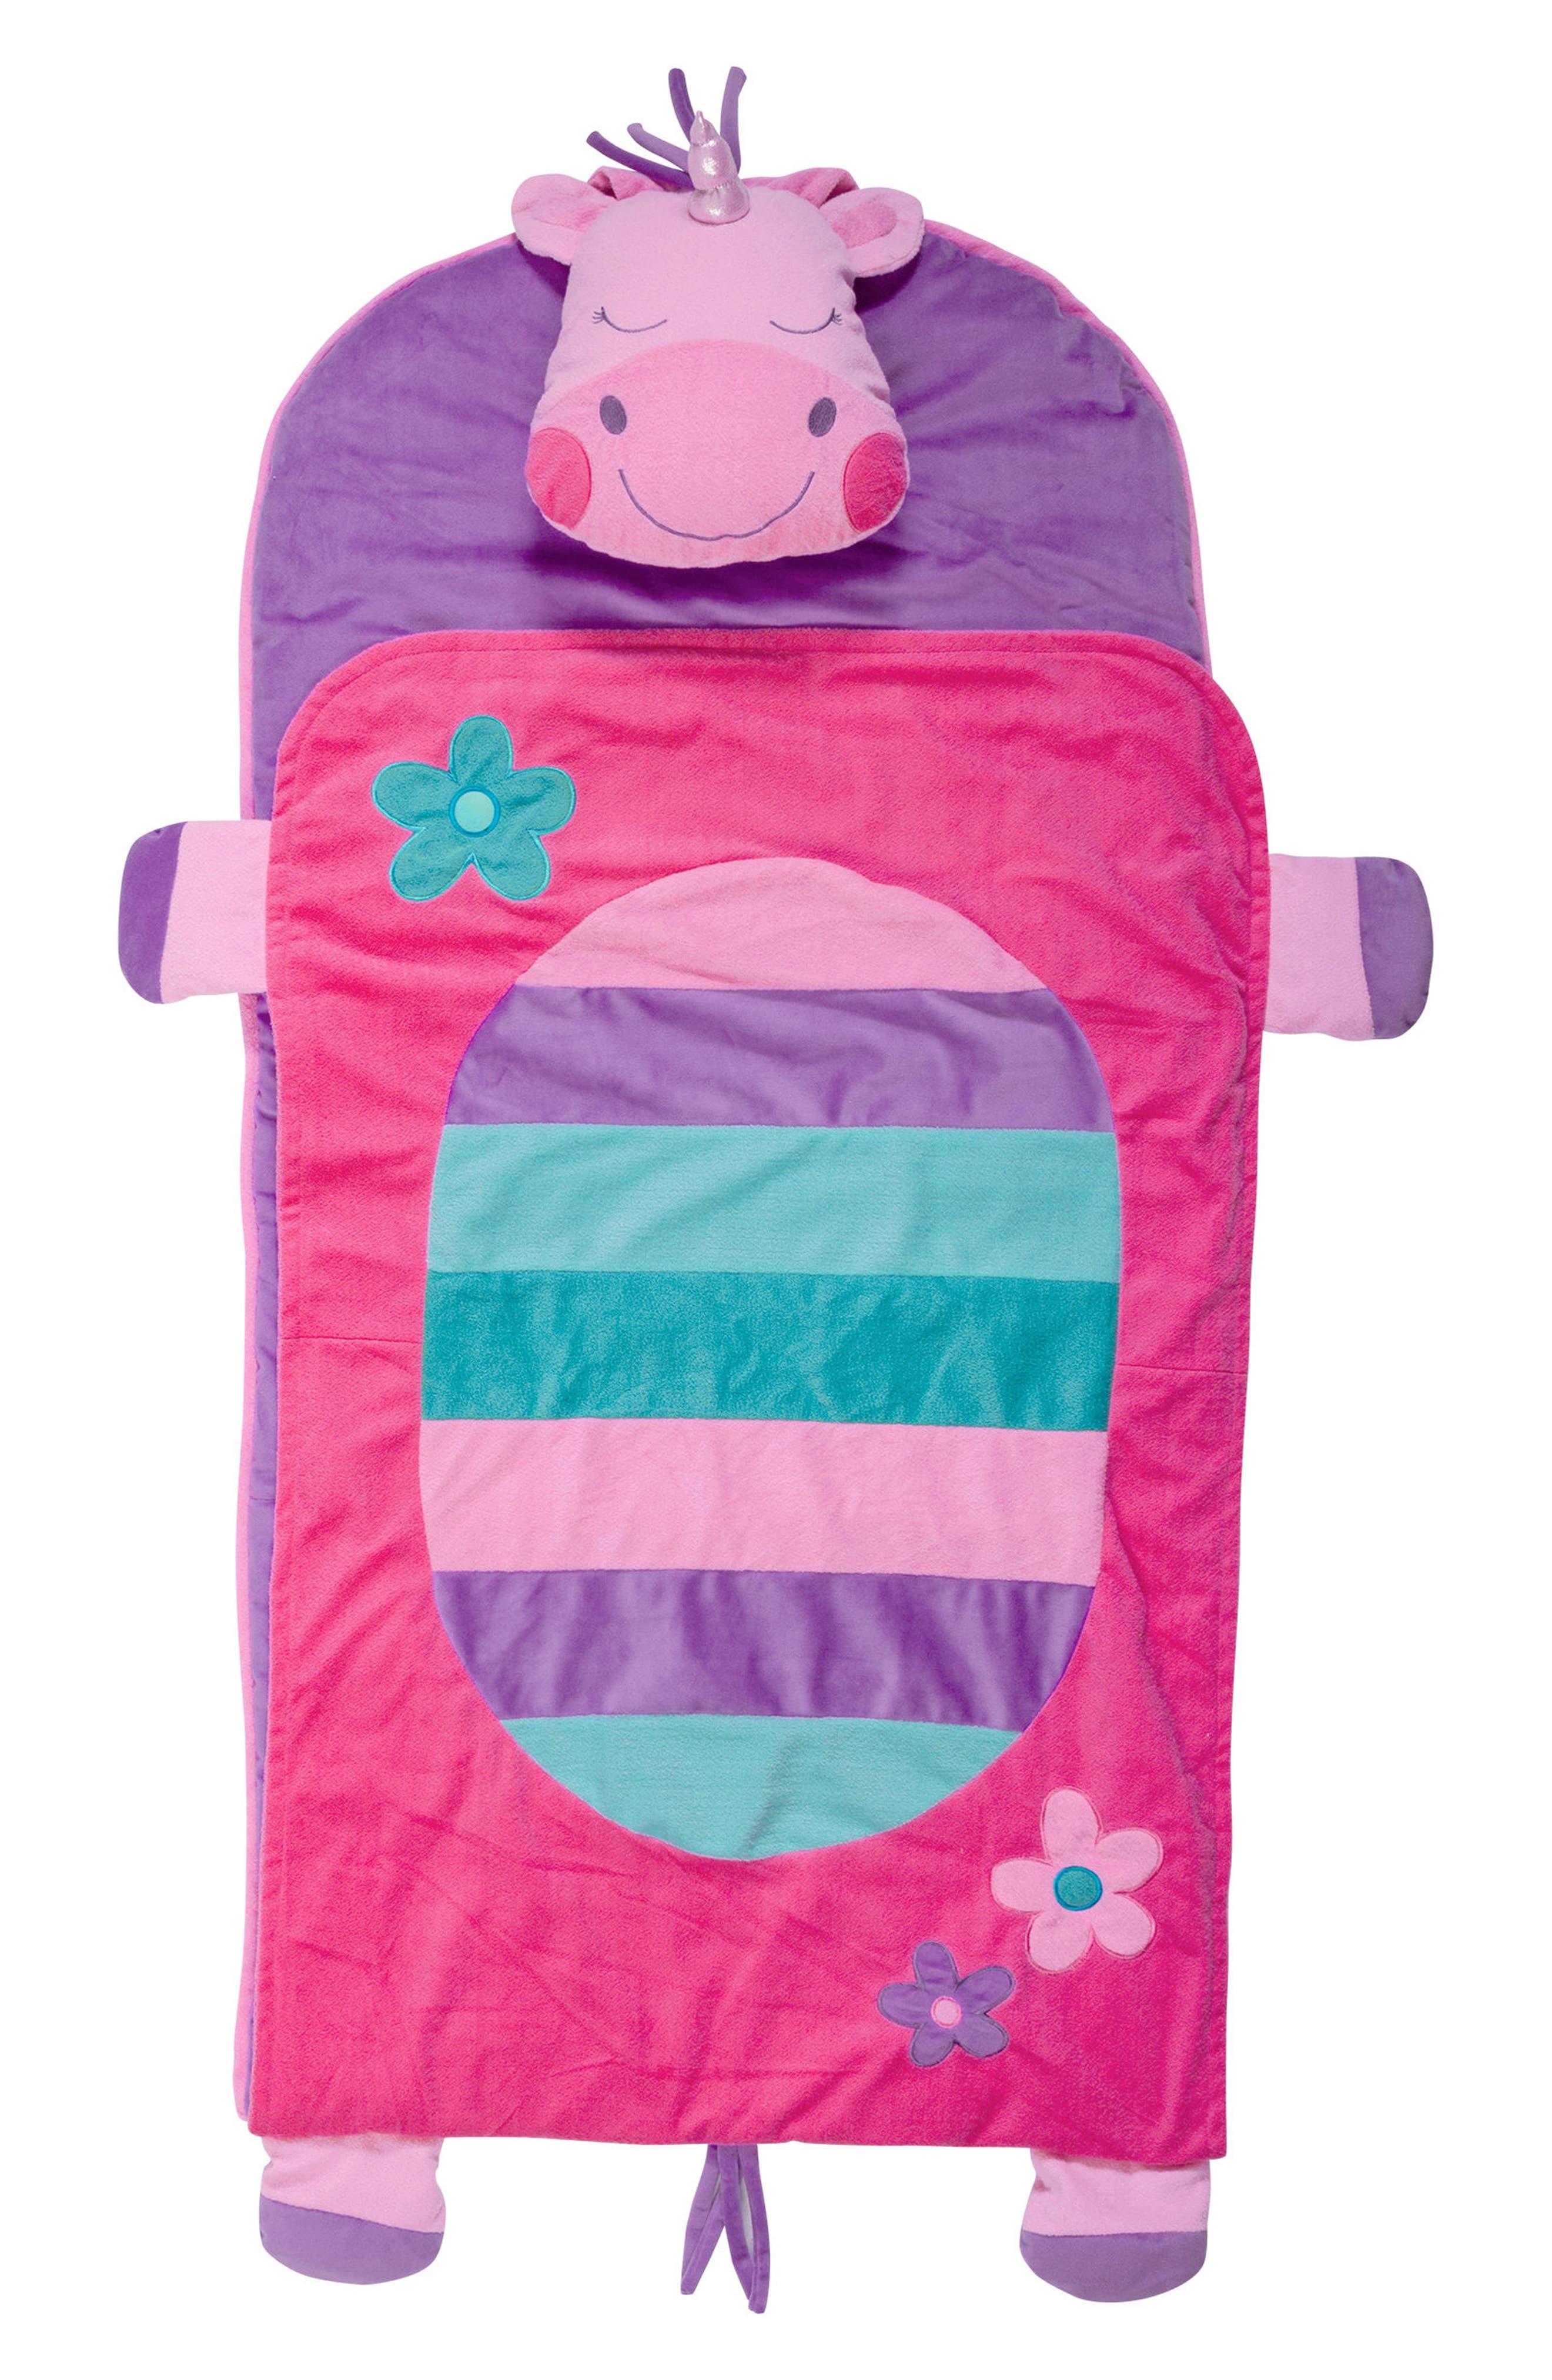 Portable Nap Mat, Pillow & Blanket,                             Alternate thumbnail 3, color,                             UNICORN